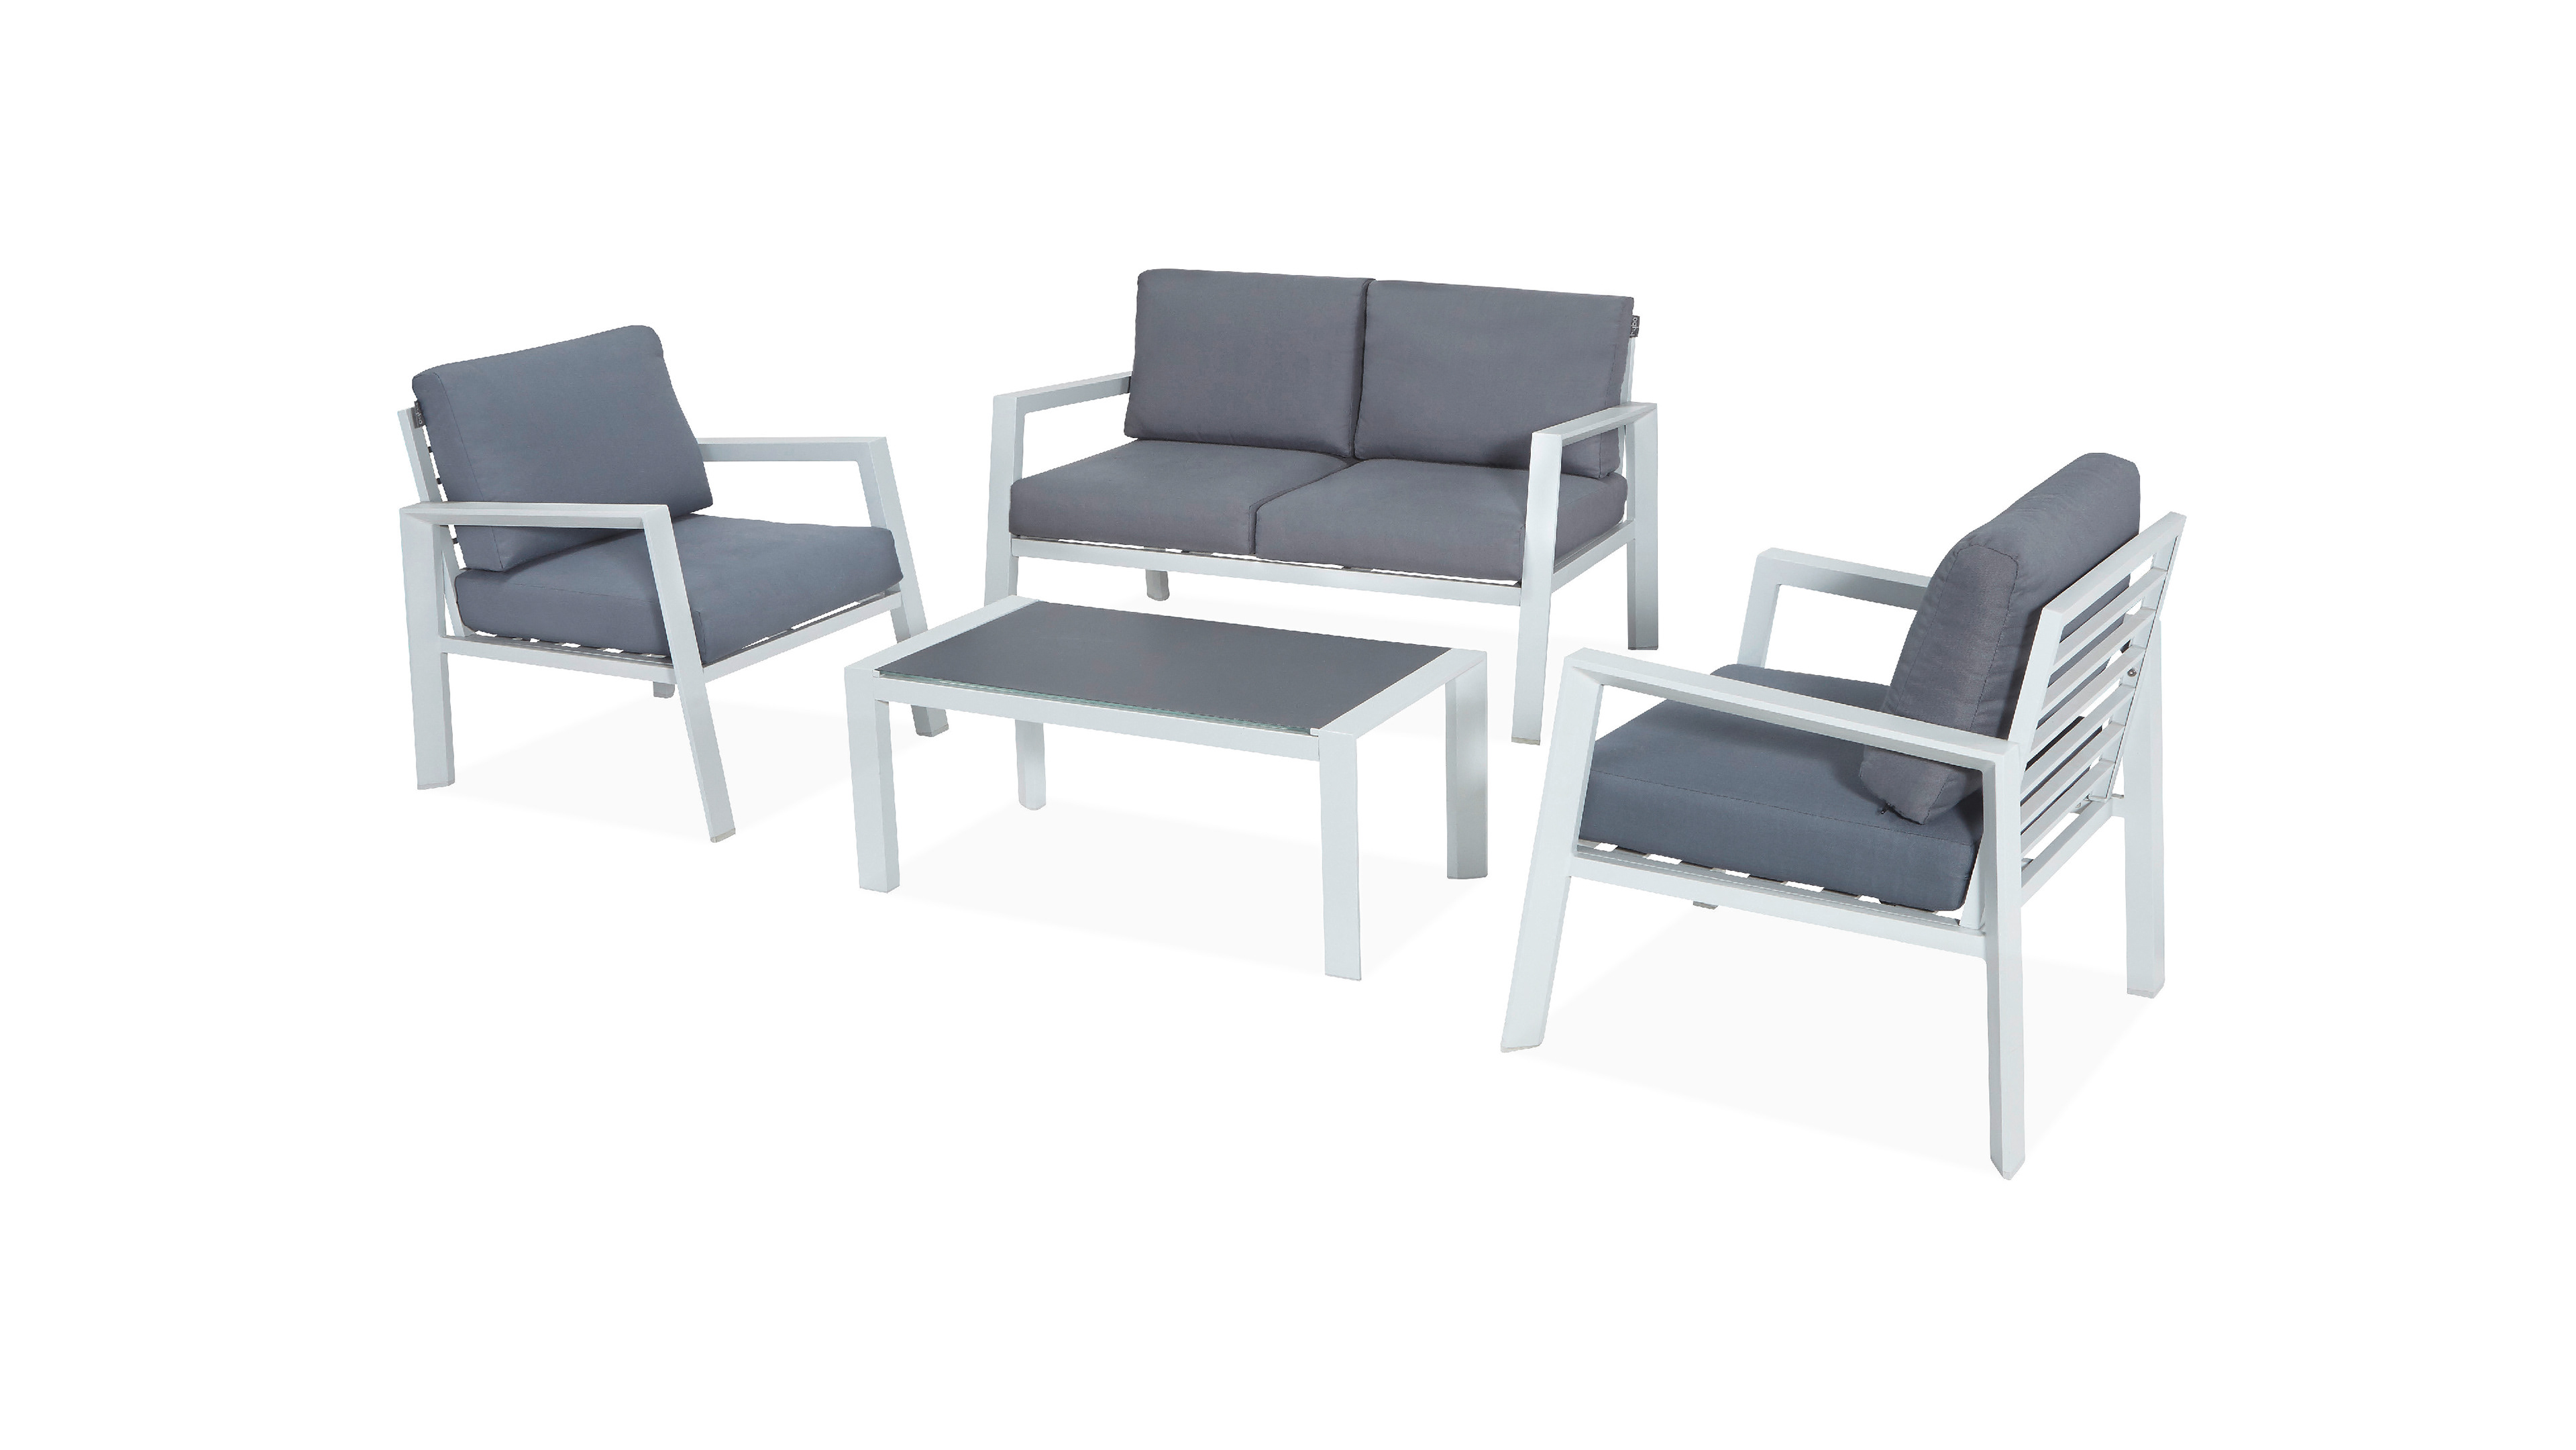 Designbycarrefour Aluminium152 Hyba # Table De Jardin Hyba